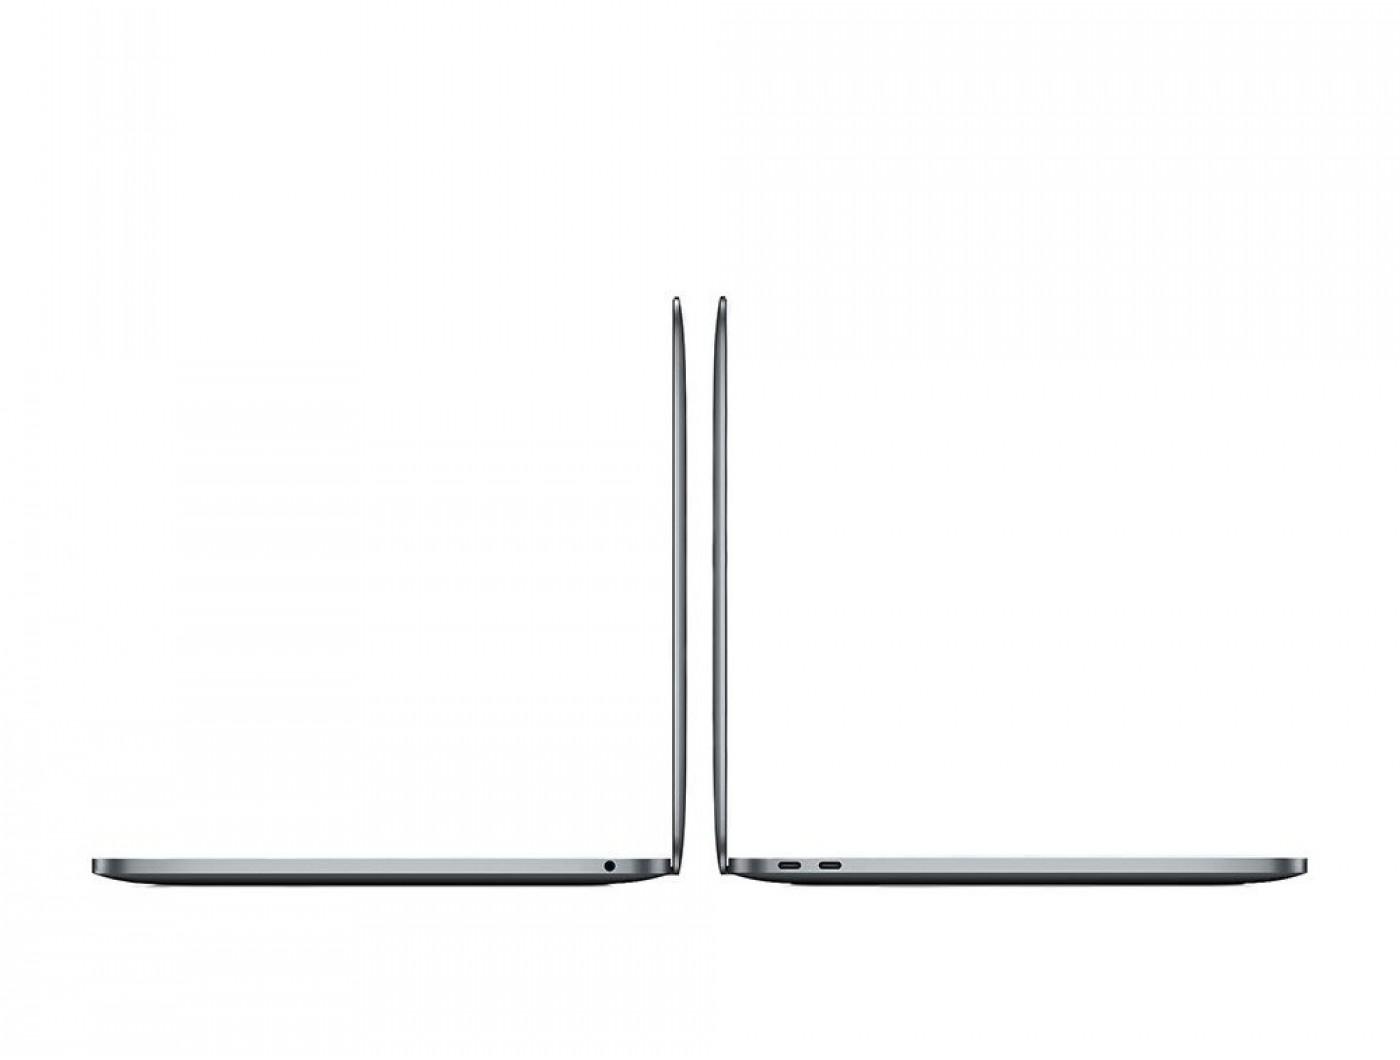 MacBook Pro 15 Touch Bar 256GB (2017)